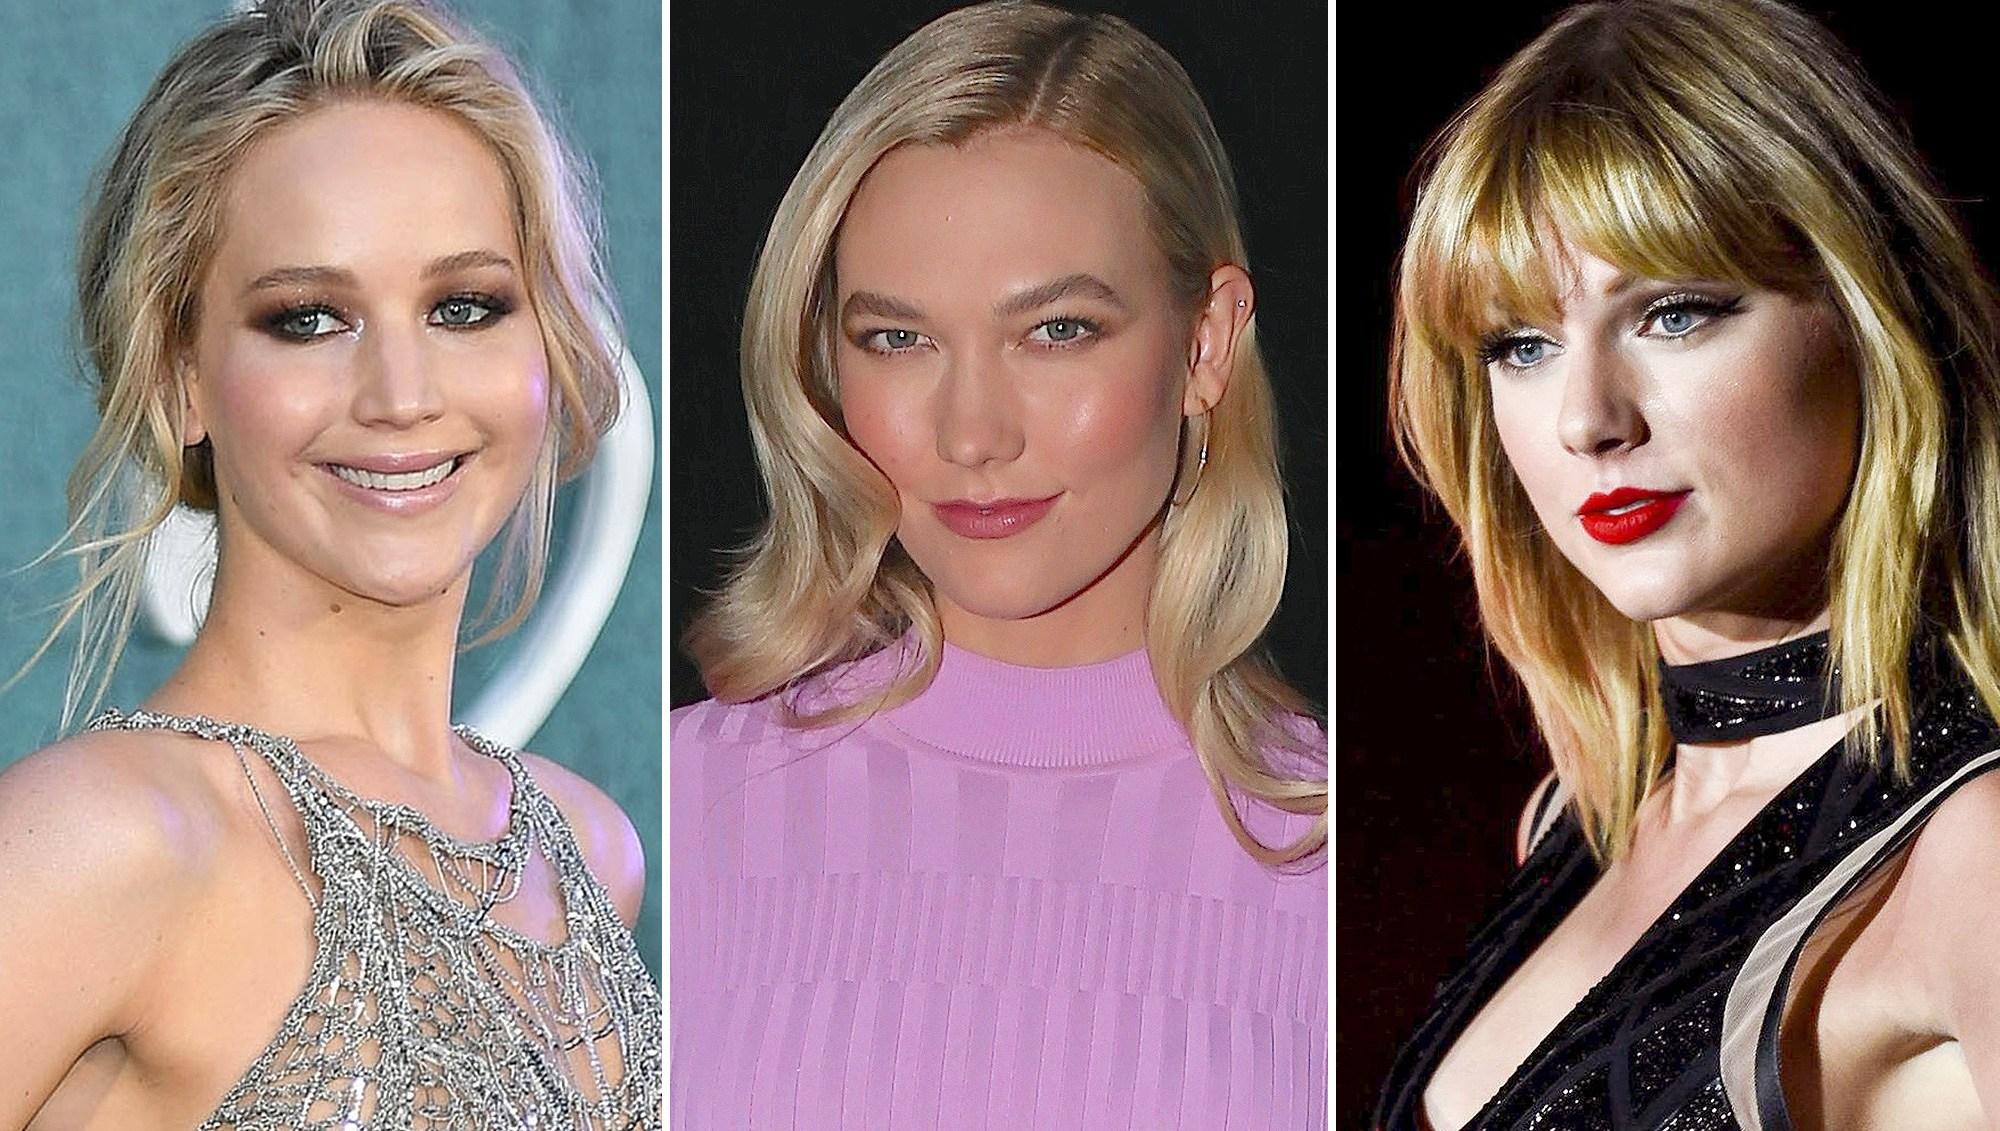 Jennifer Lawrence, Karlie Kloss, Taylor Swift